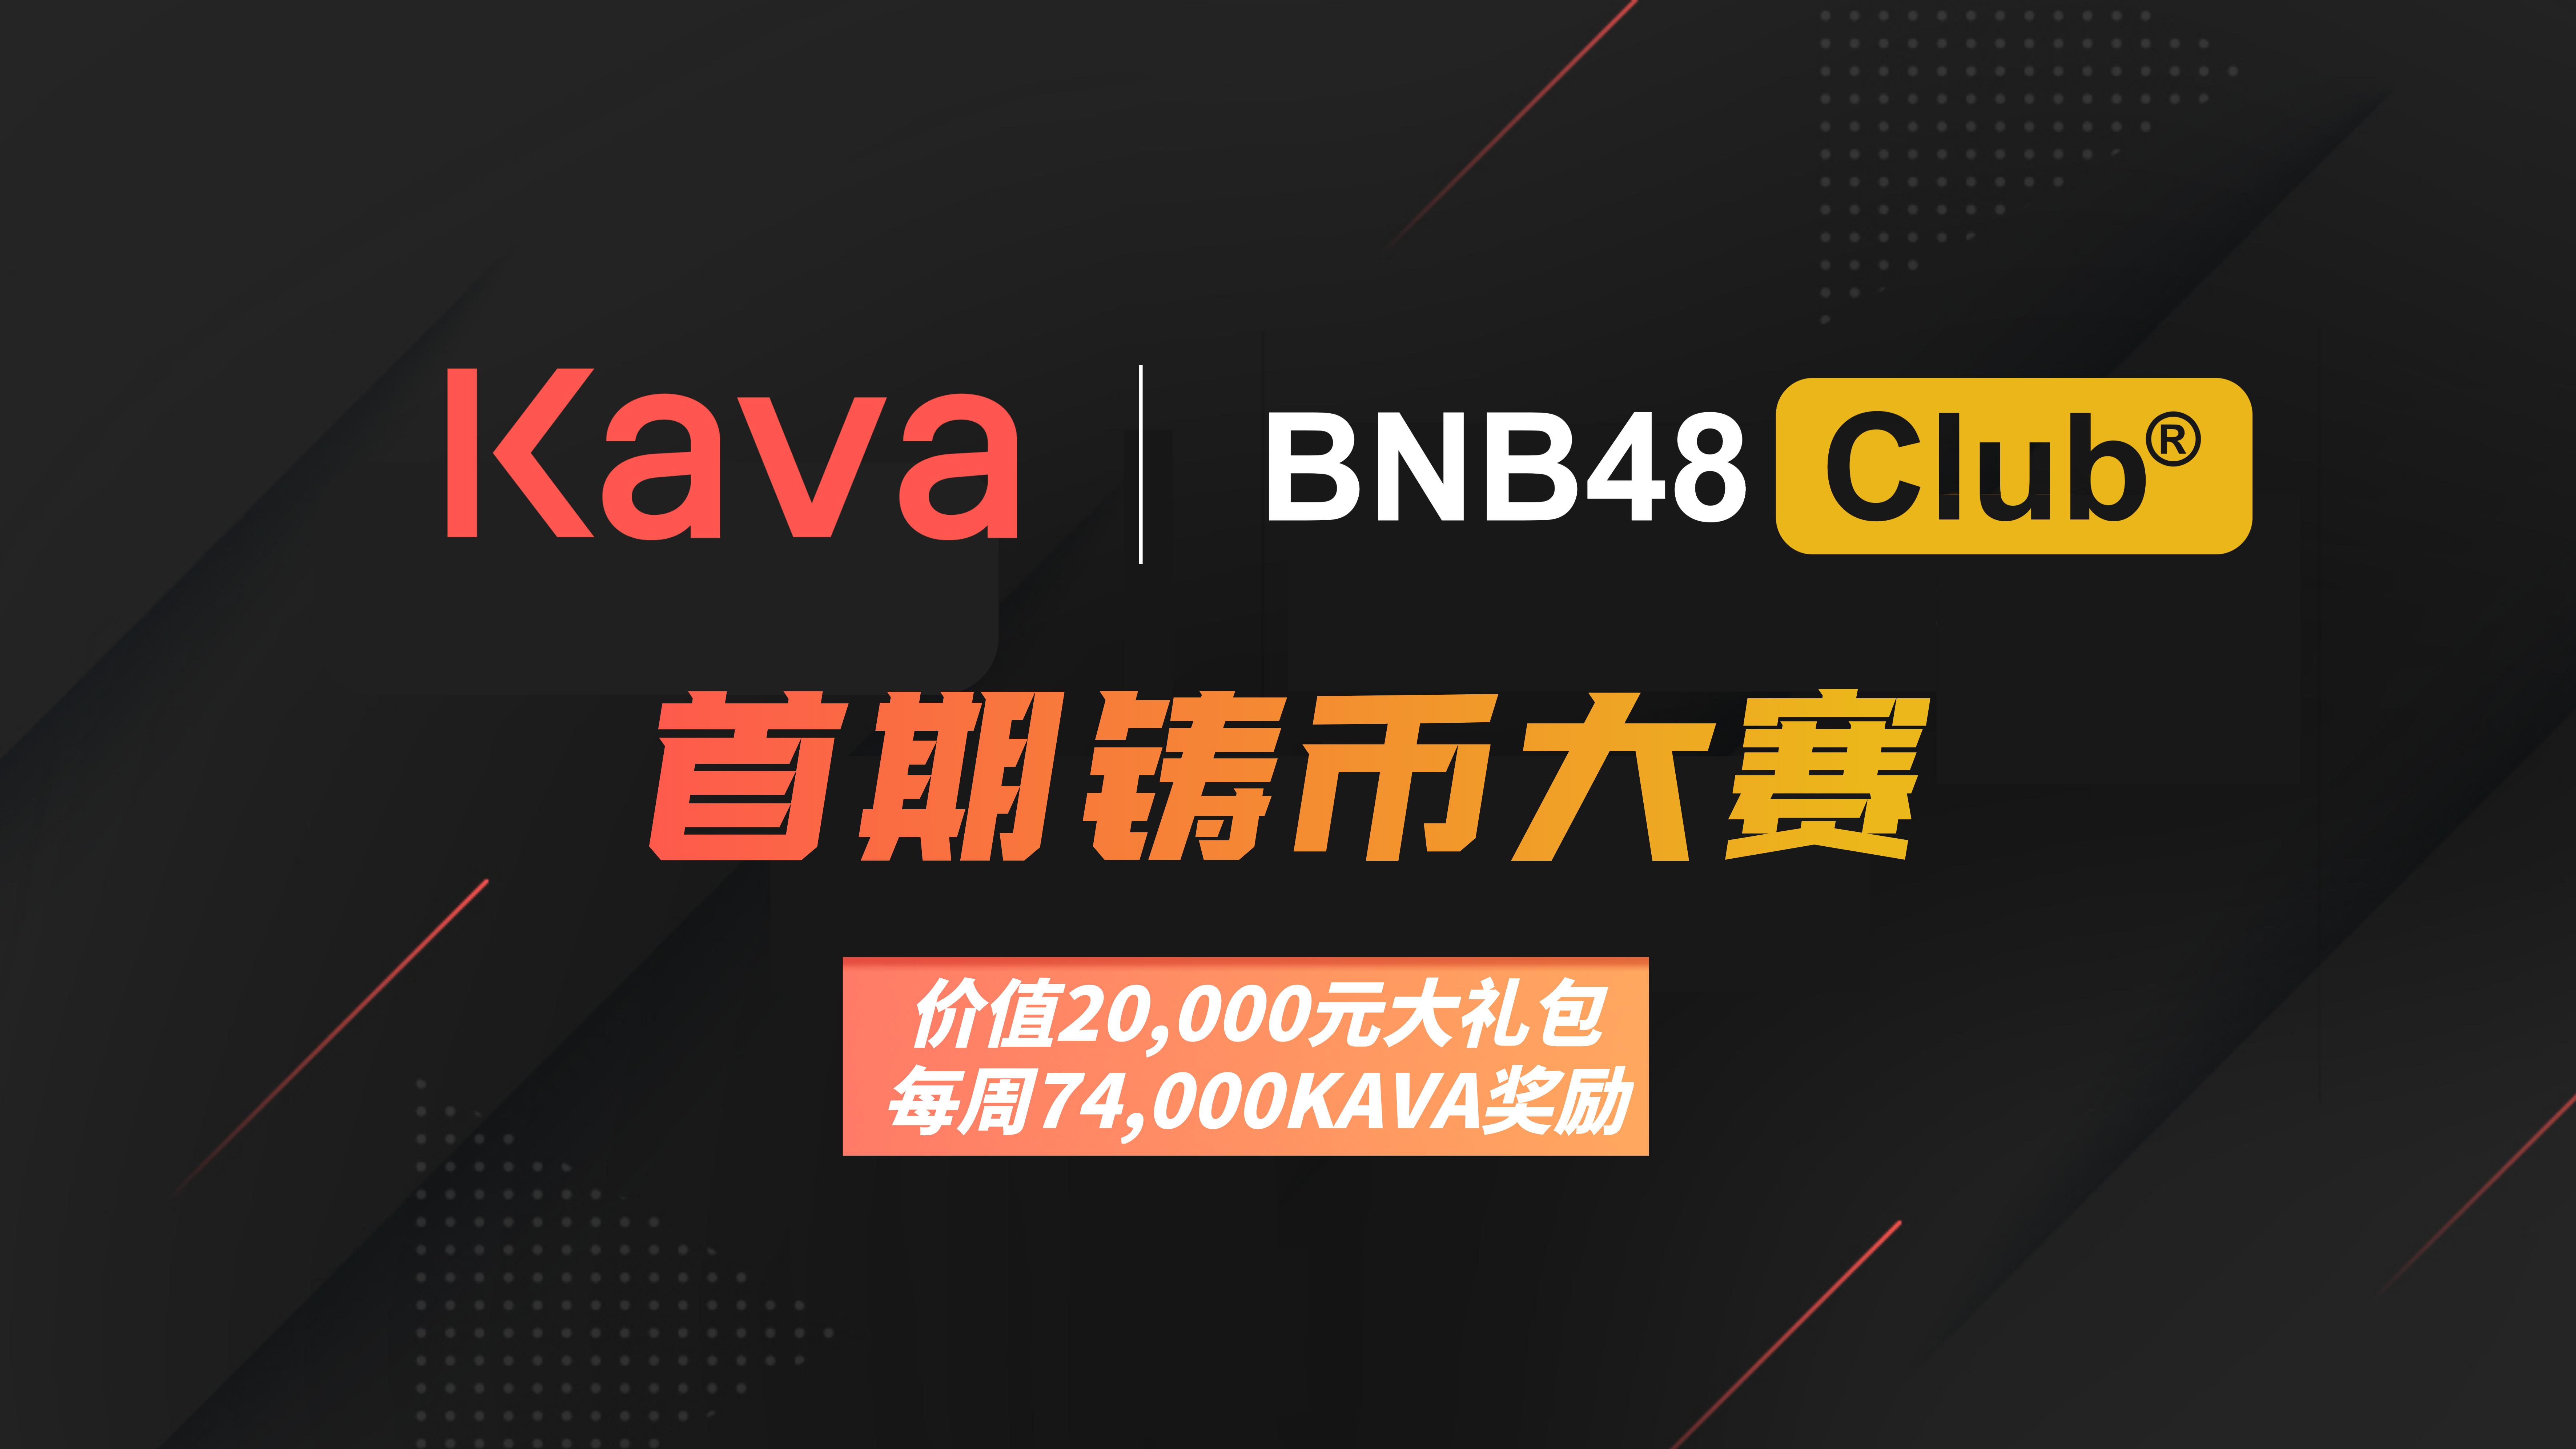 Kava & BNB48 Club 联合举办首期铸币大赛插图